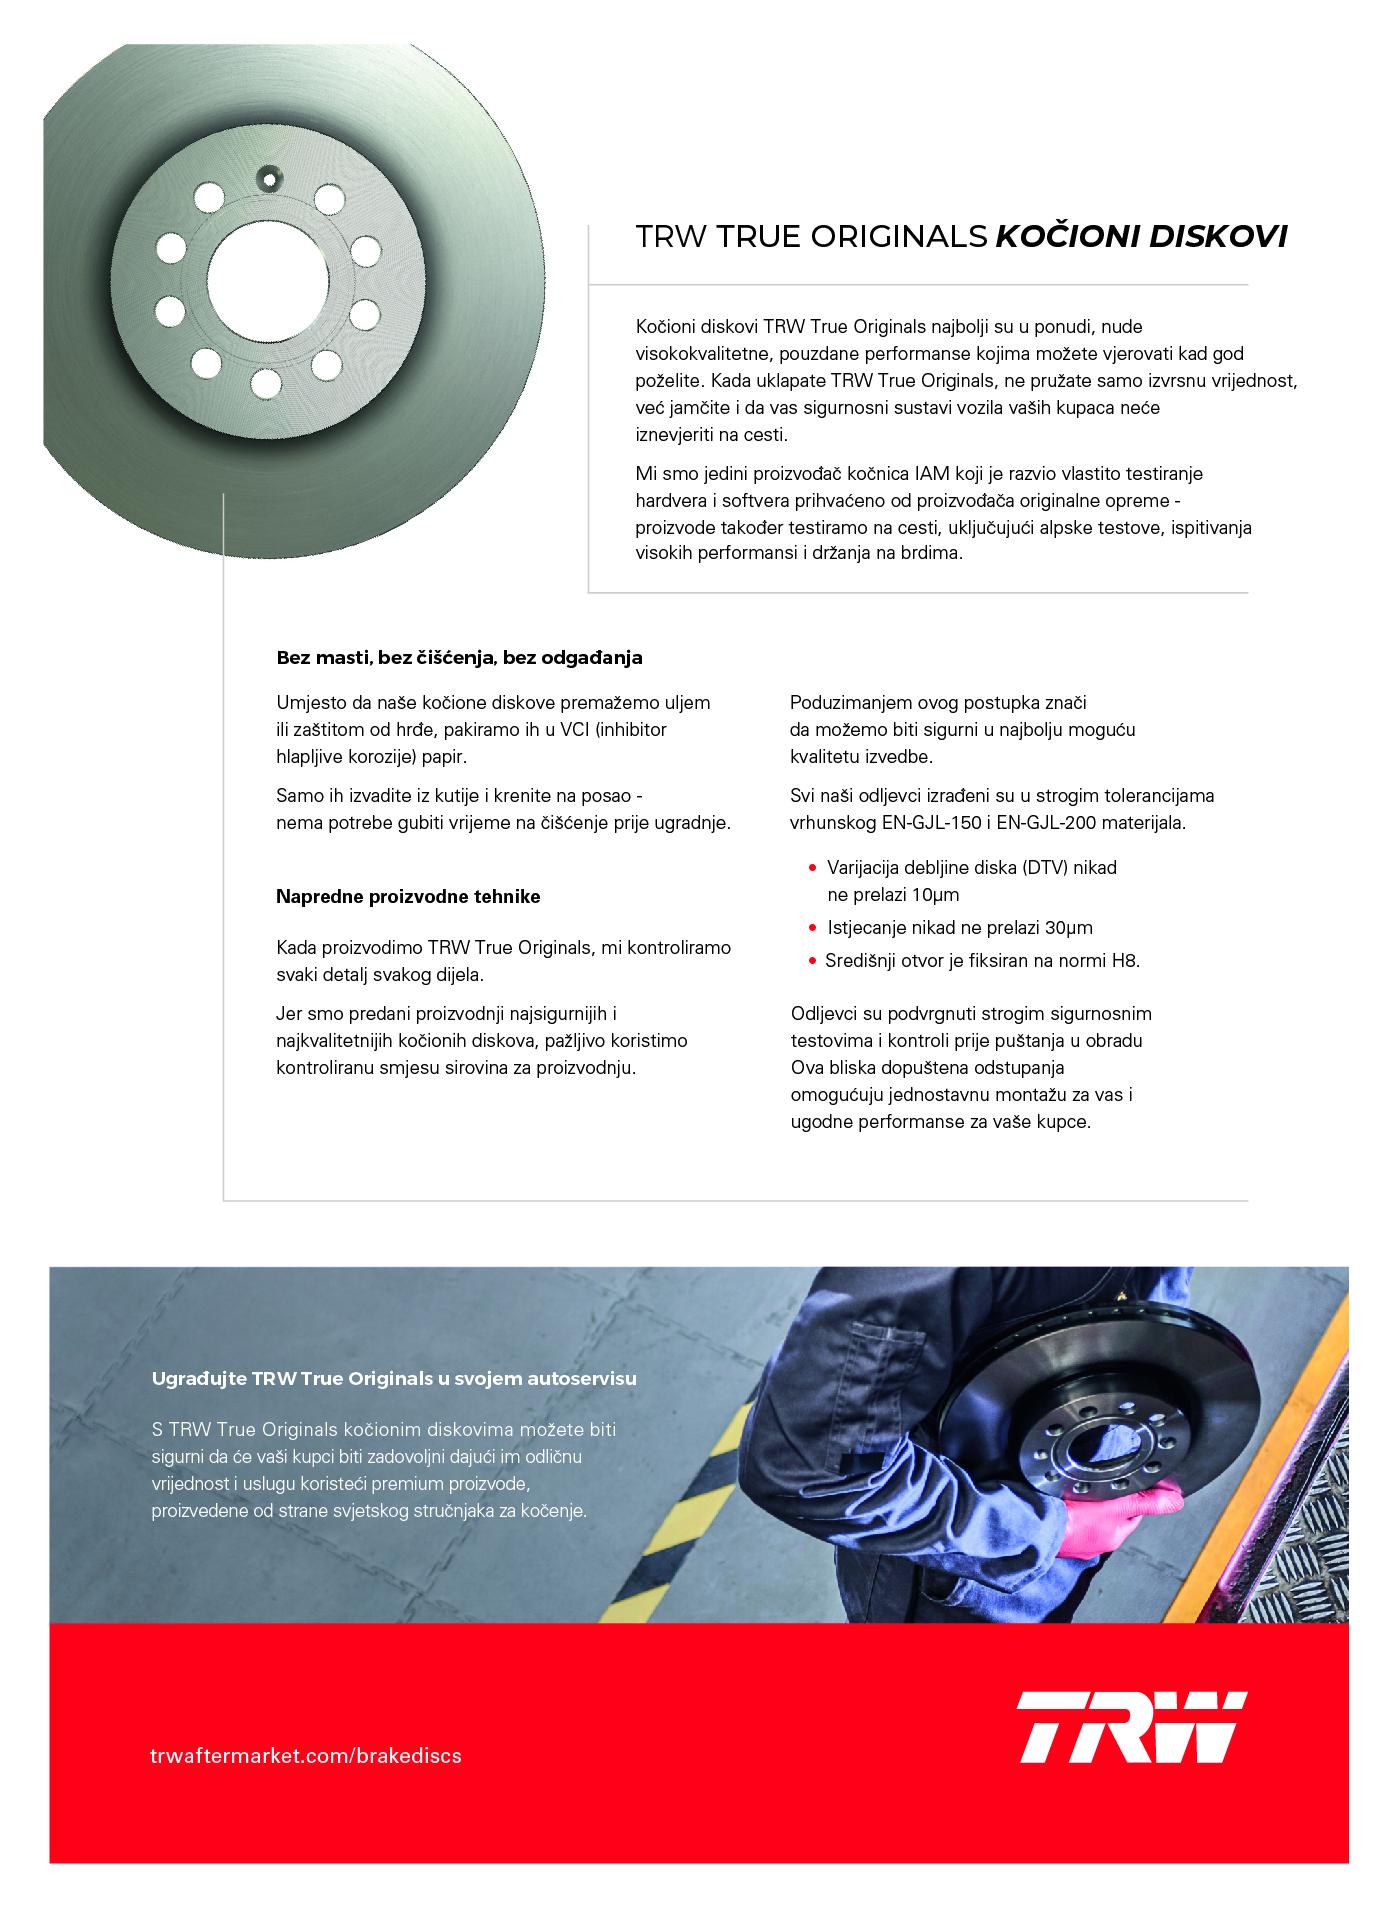 TRW_PC_J11151-1755_Black_Painted_Discs_A4_Fact_Sheet_A4_CMYK_202009_HR-02.jpg